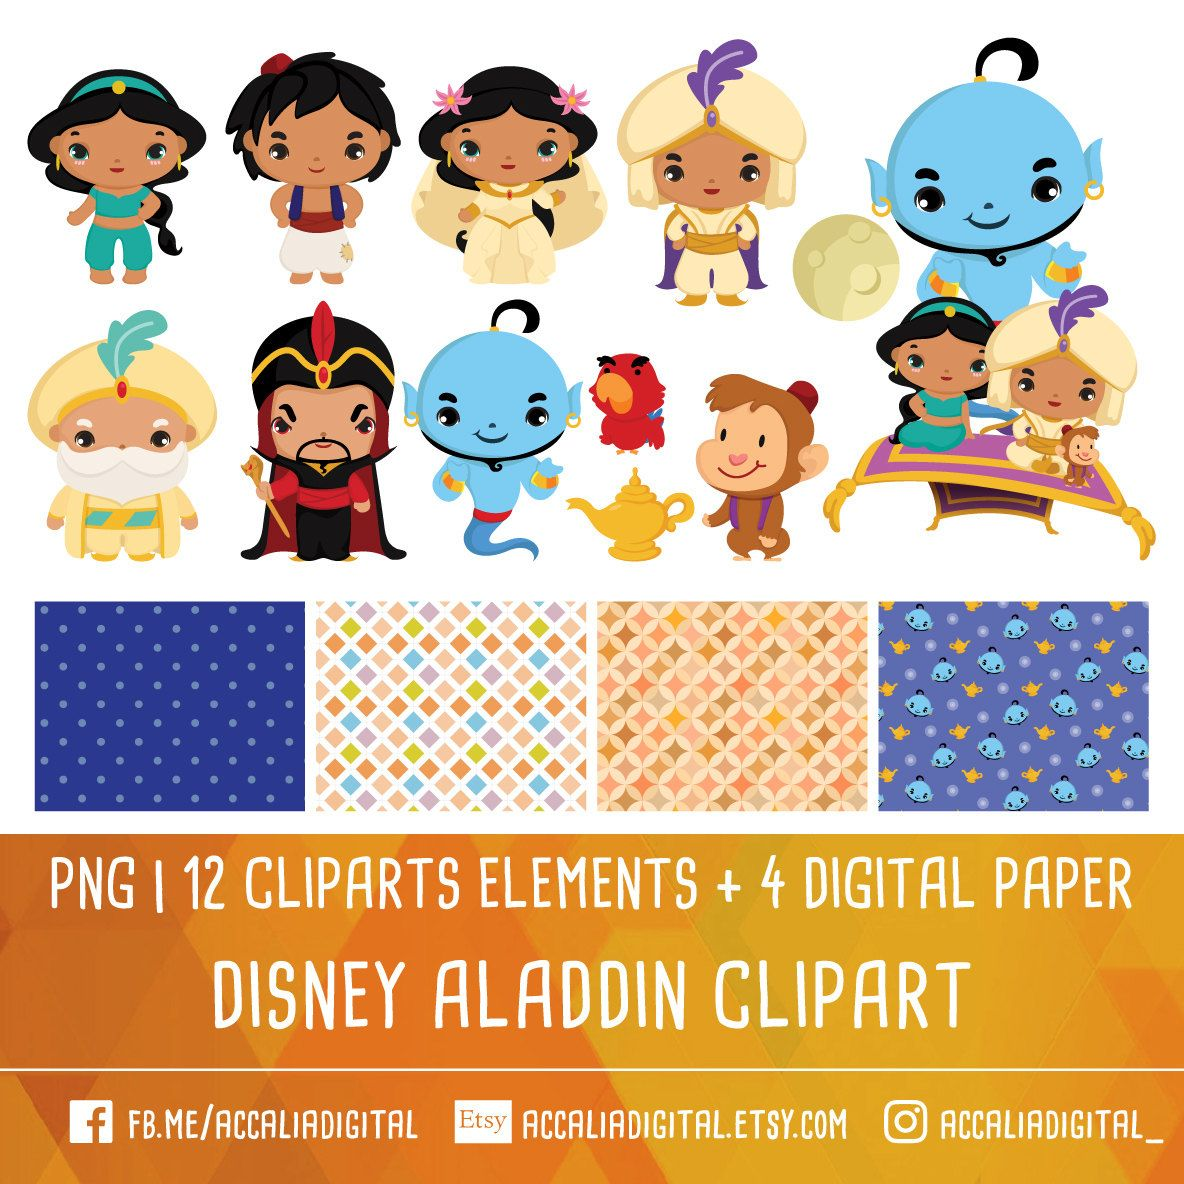 Aladdin Clip Art Prince Clipart Jasmine Clip Art Disney Etsy Clip Art Princess Sticker Aladdin